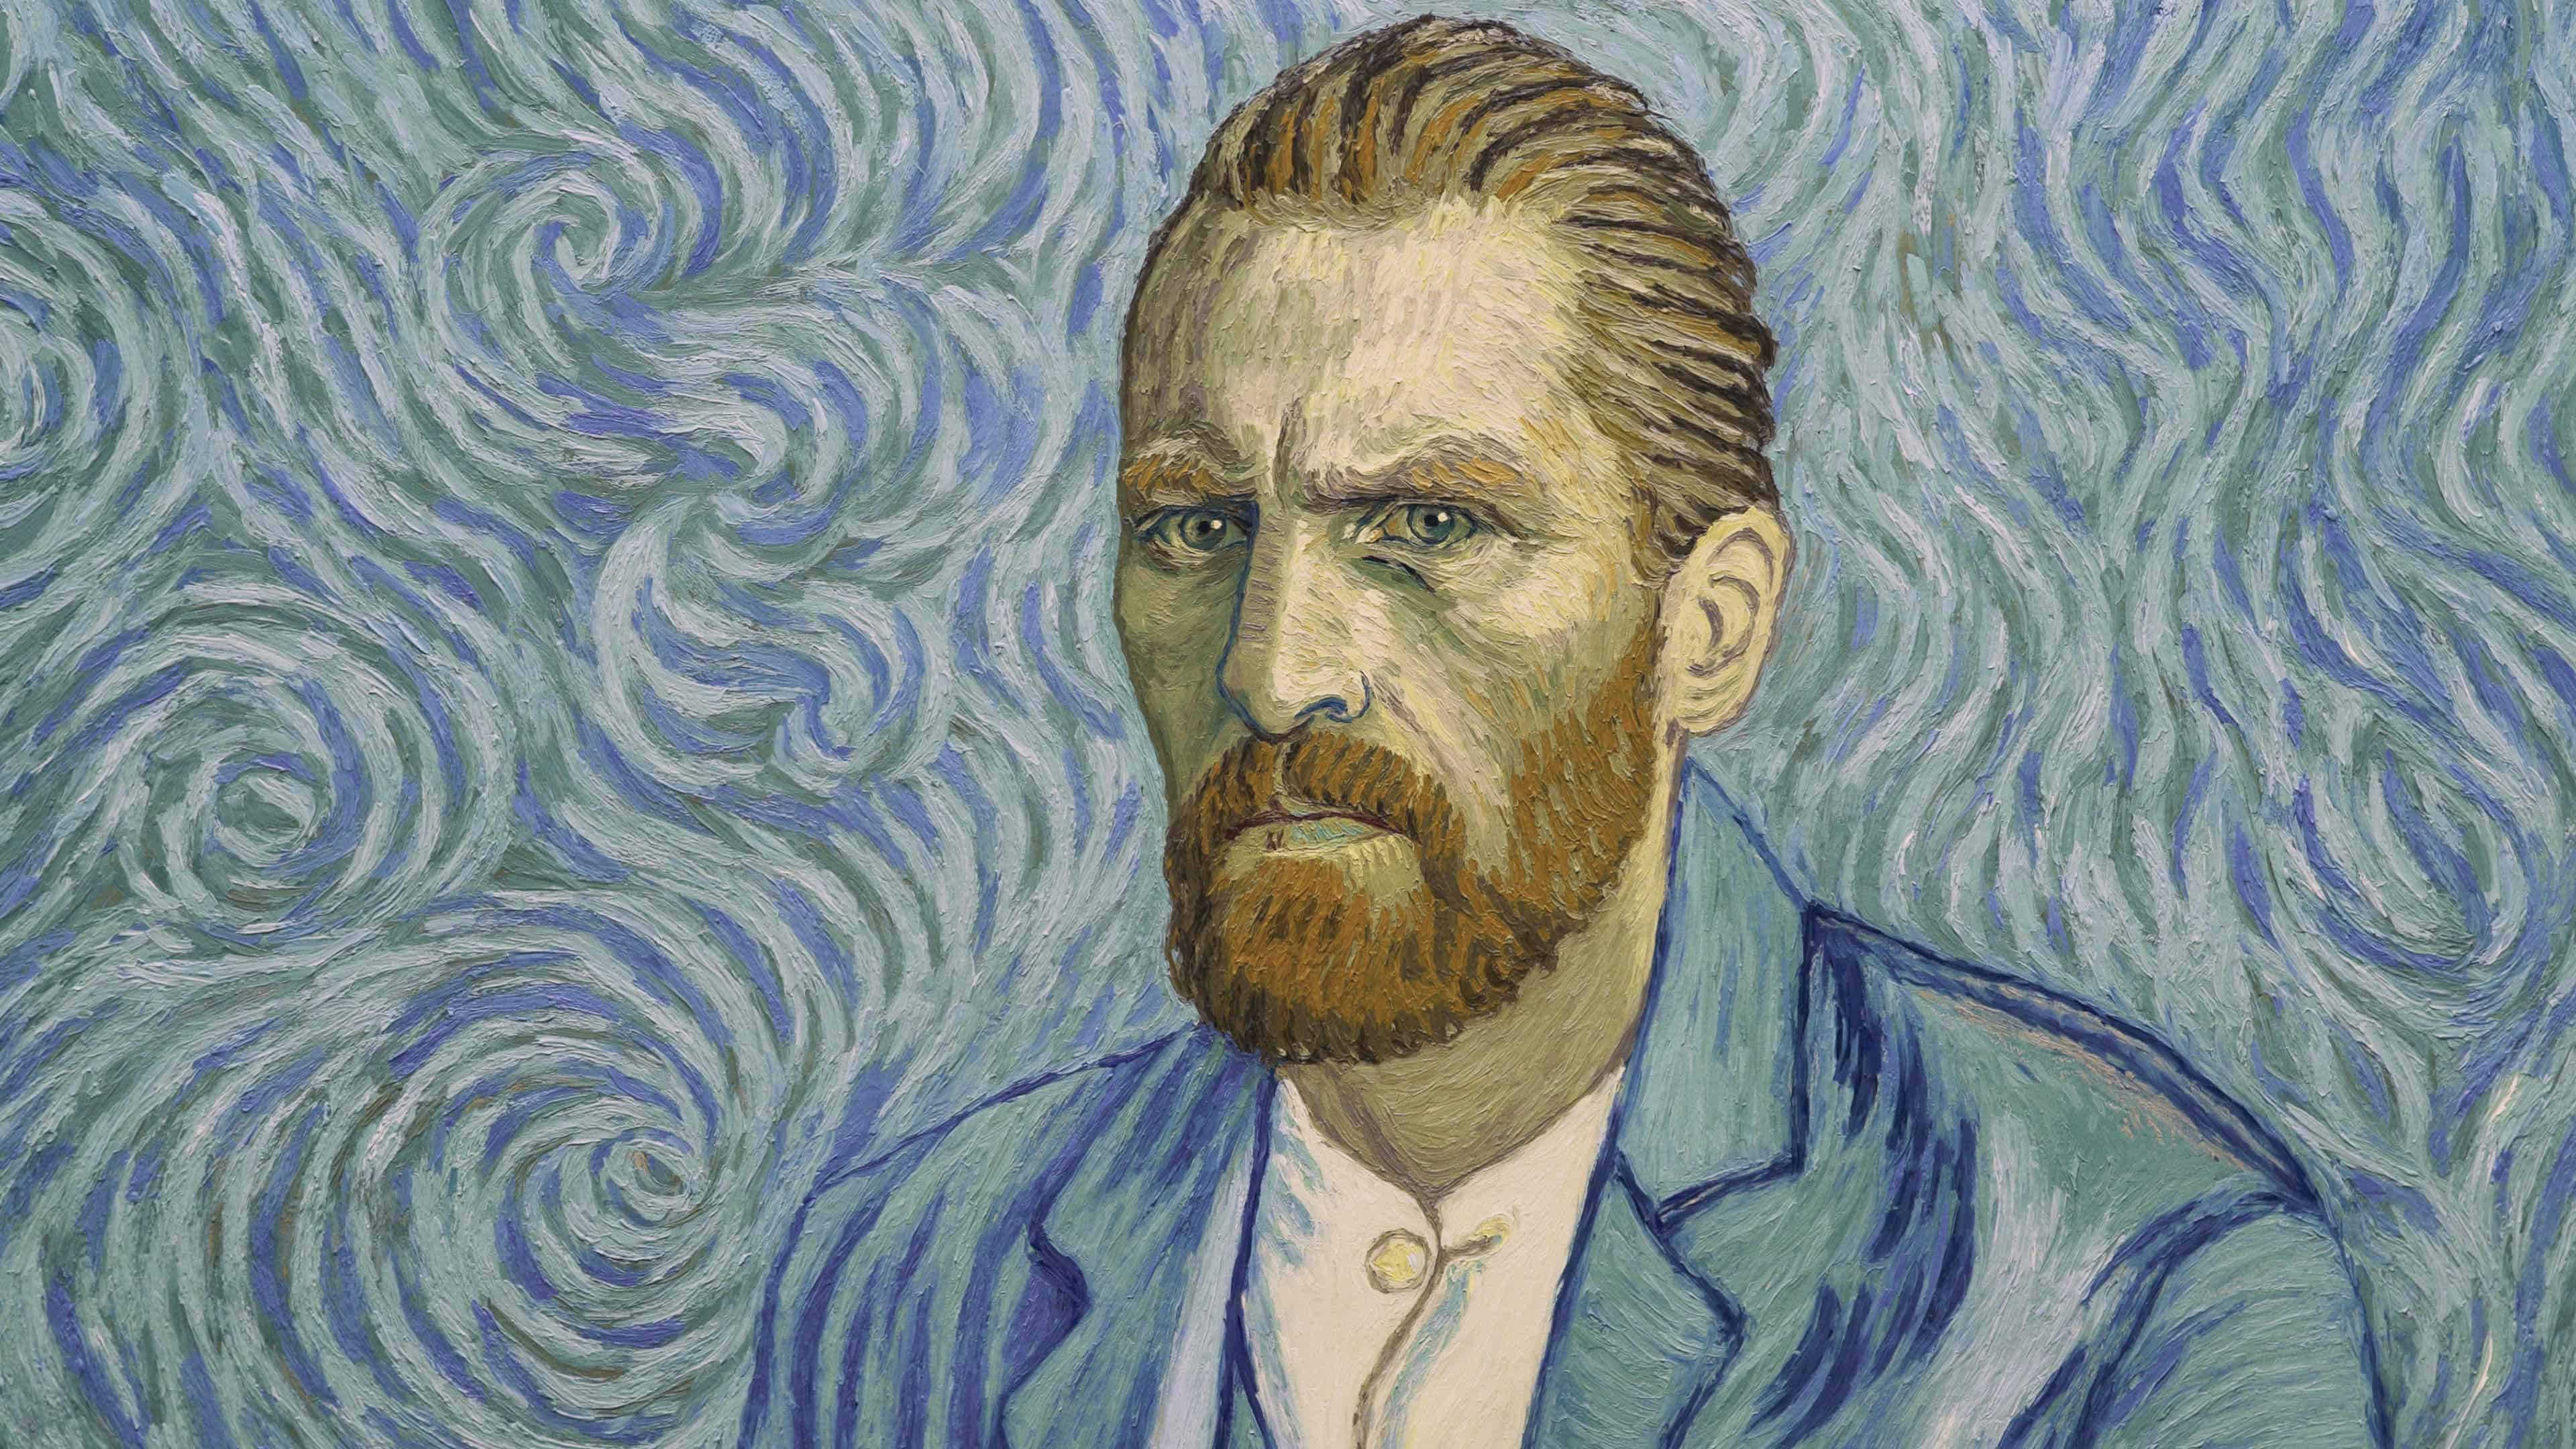 vincent van gogh self portrait painting uhd 4k wallpaper